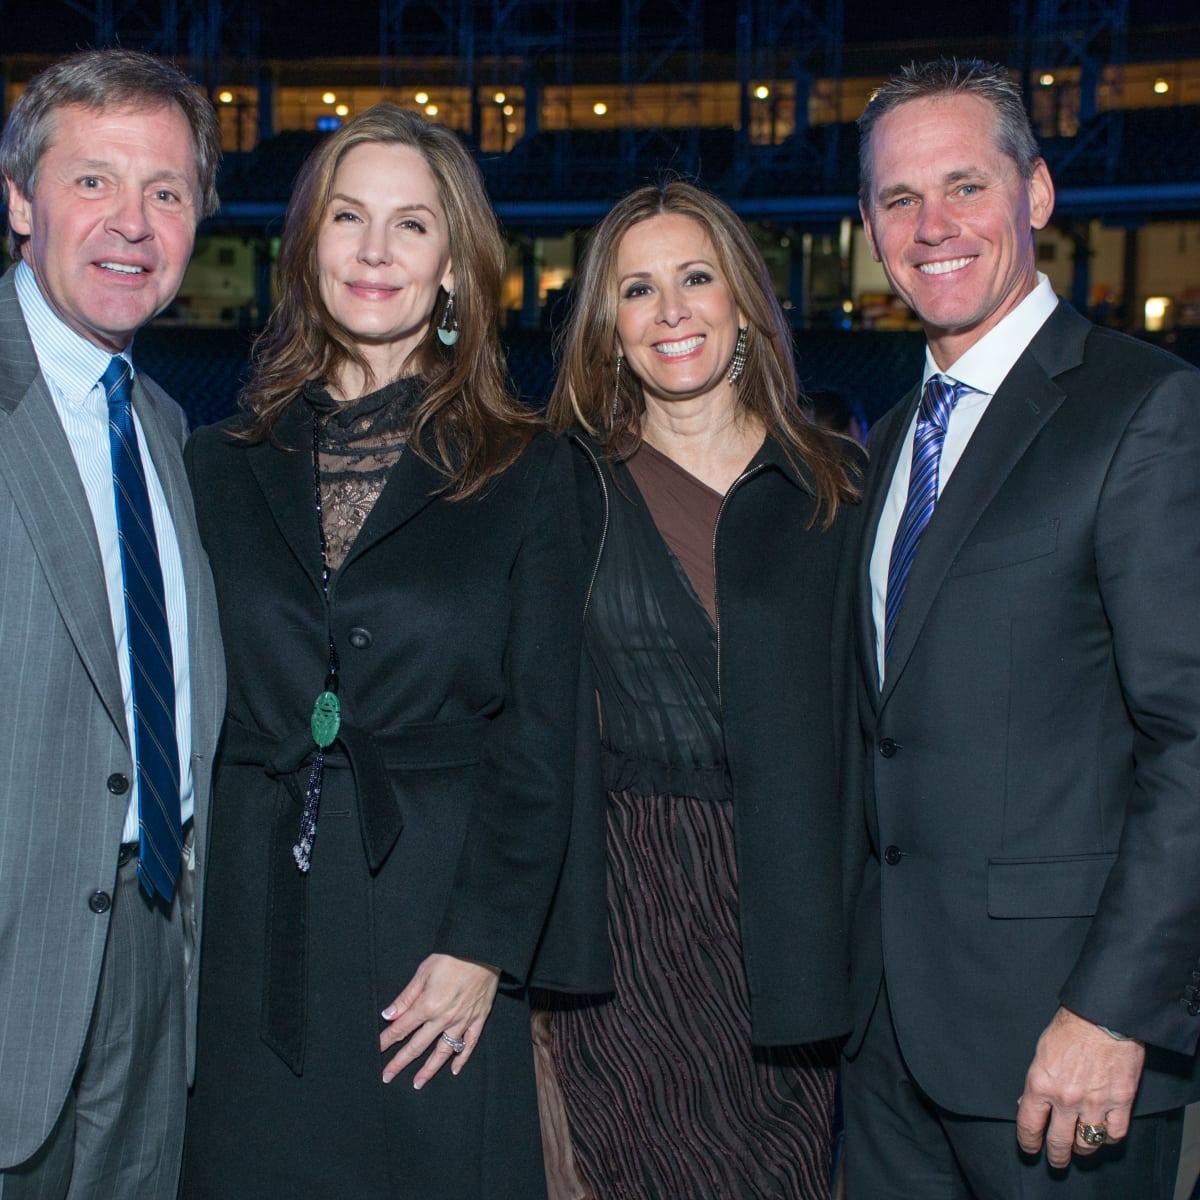 Astros Diamond Gala, Jan. 2016, Paul Murphy, Katherine Murphy, Patty Biggio, Craig Biggio